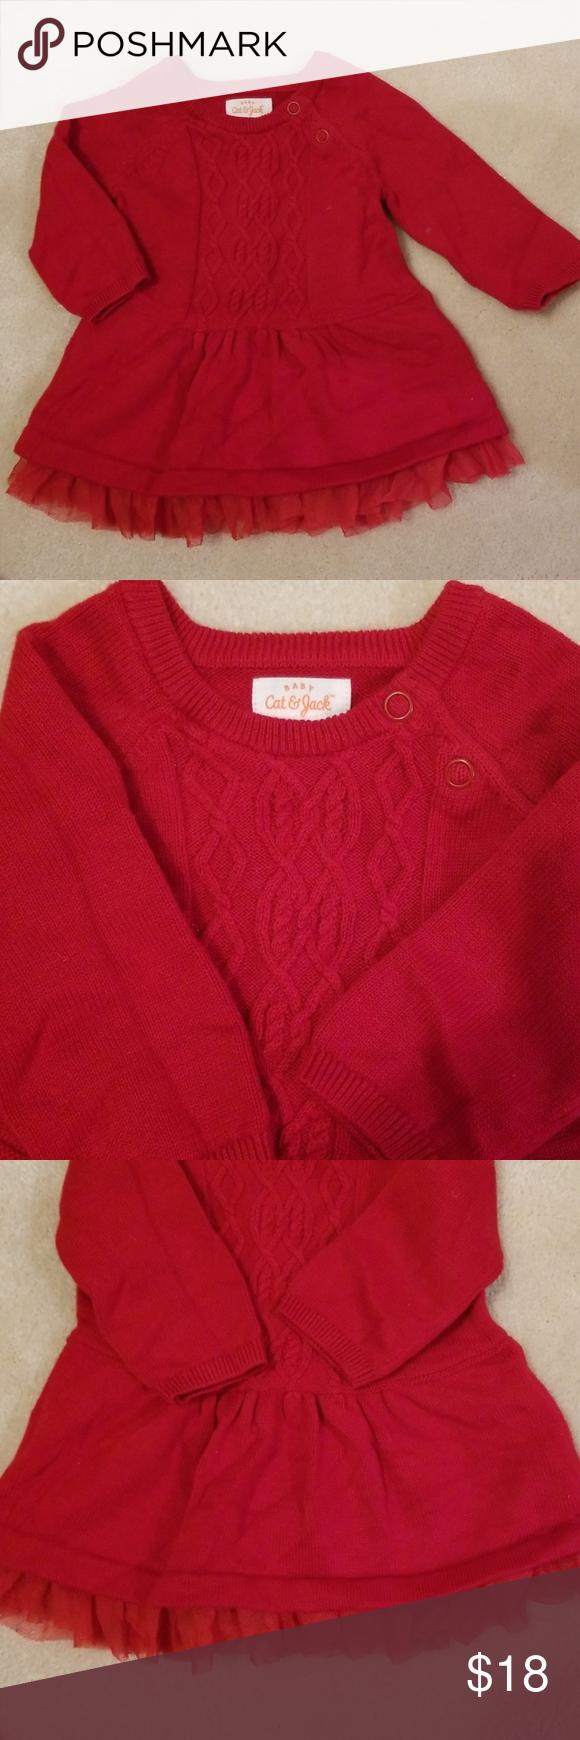 Baby Girl Sweater Dress Girls Sweaters Red Sweater Dress Baby Girl Sweaters [ 1740 x 580 Pixel ]